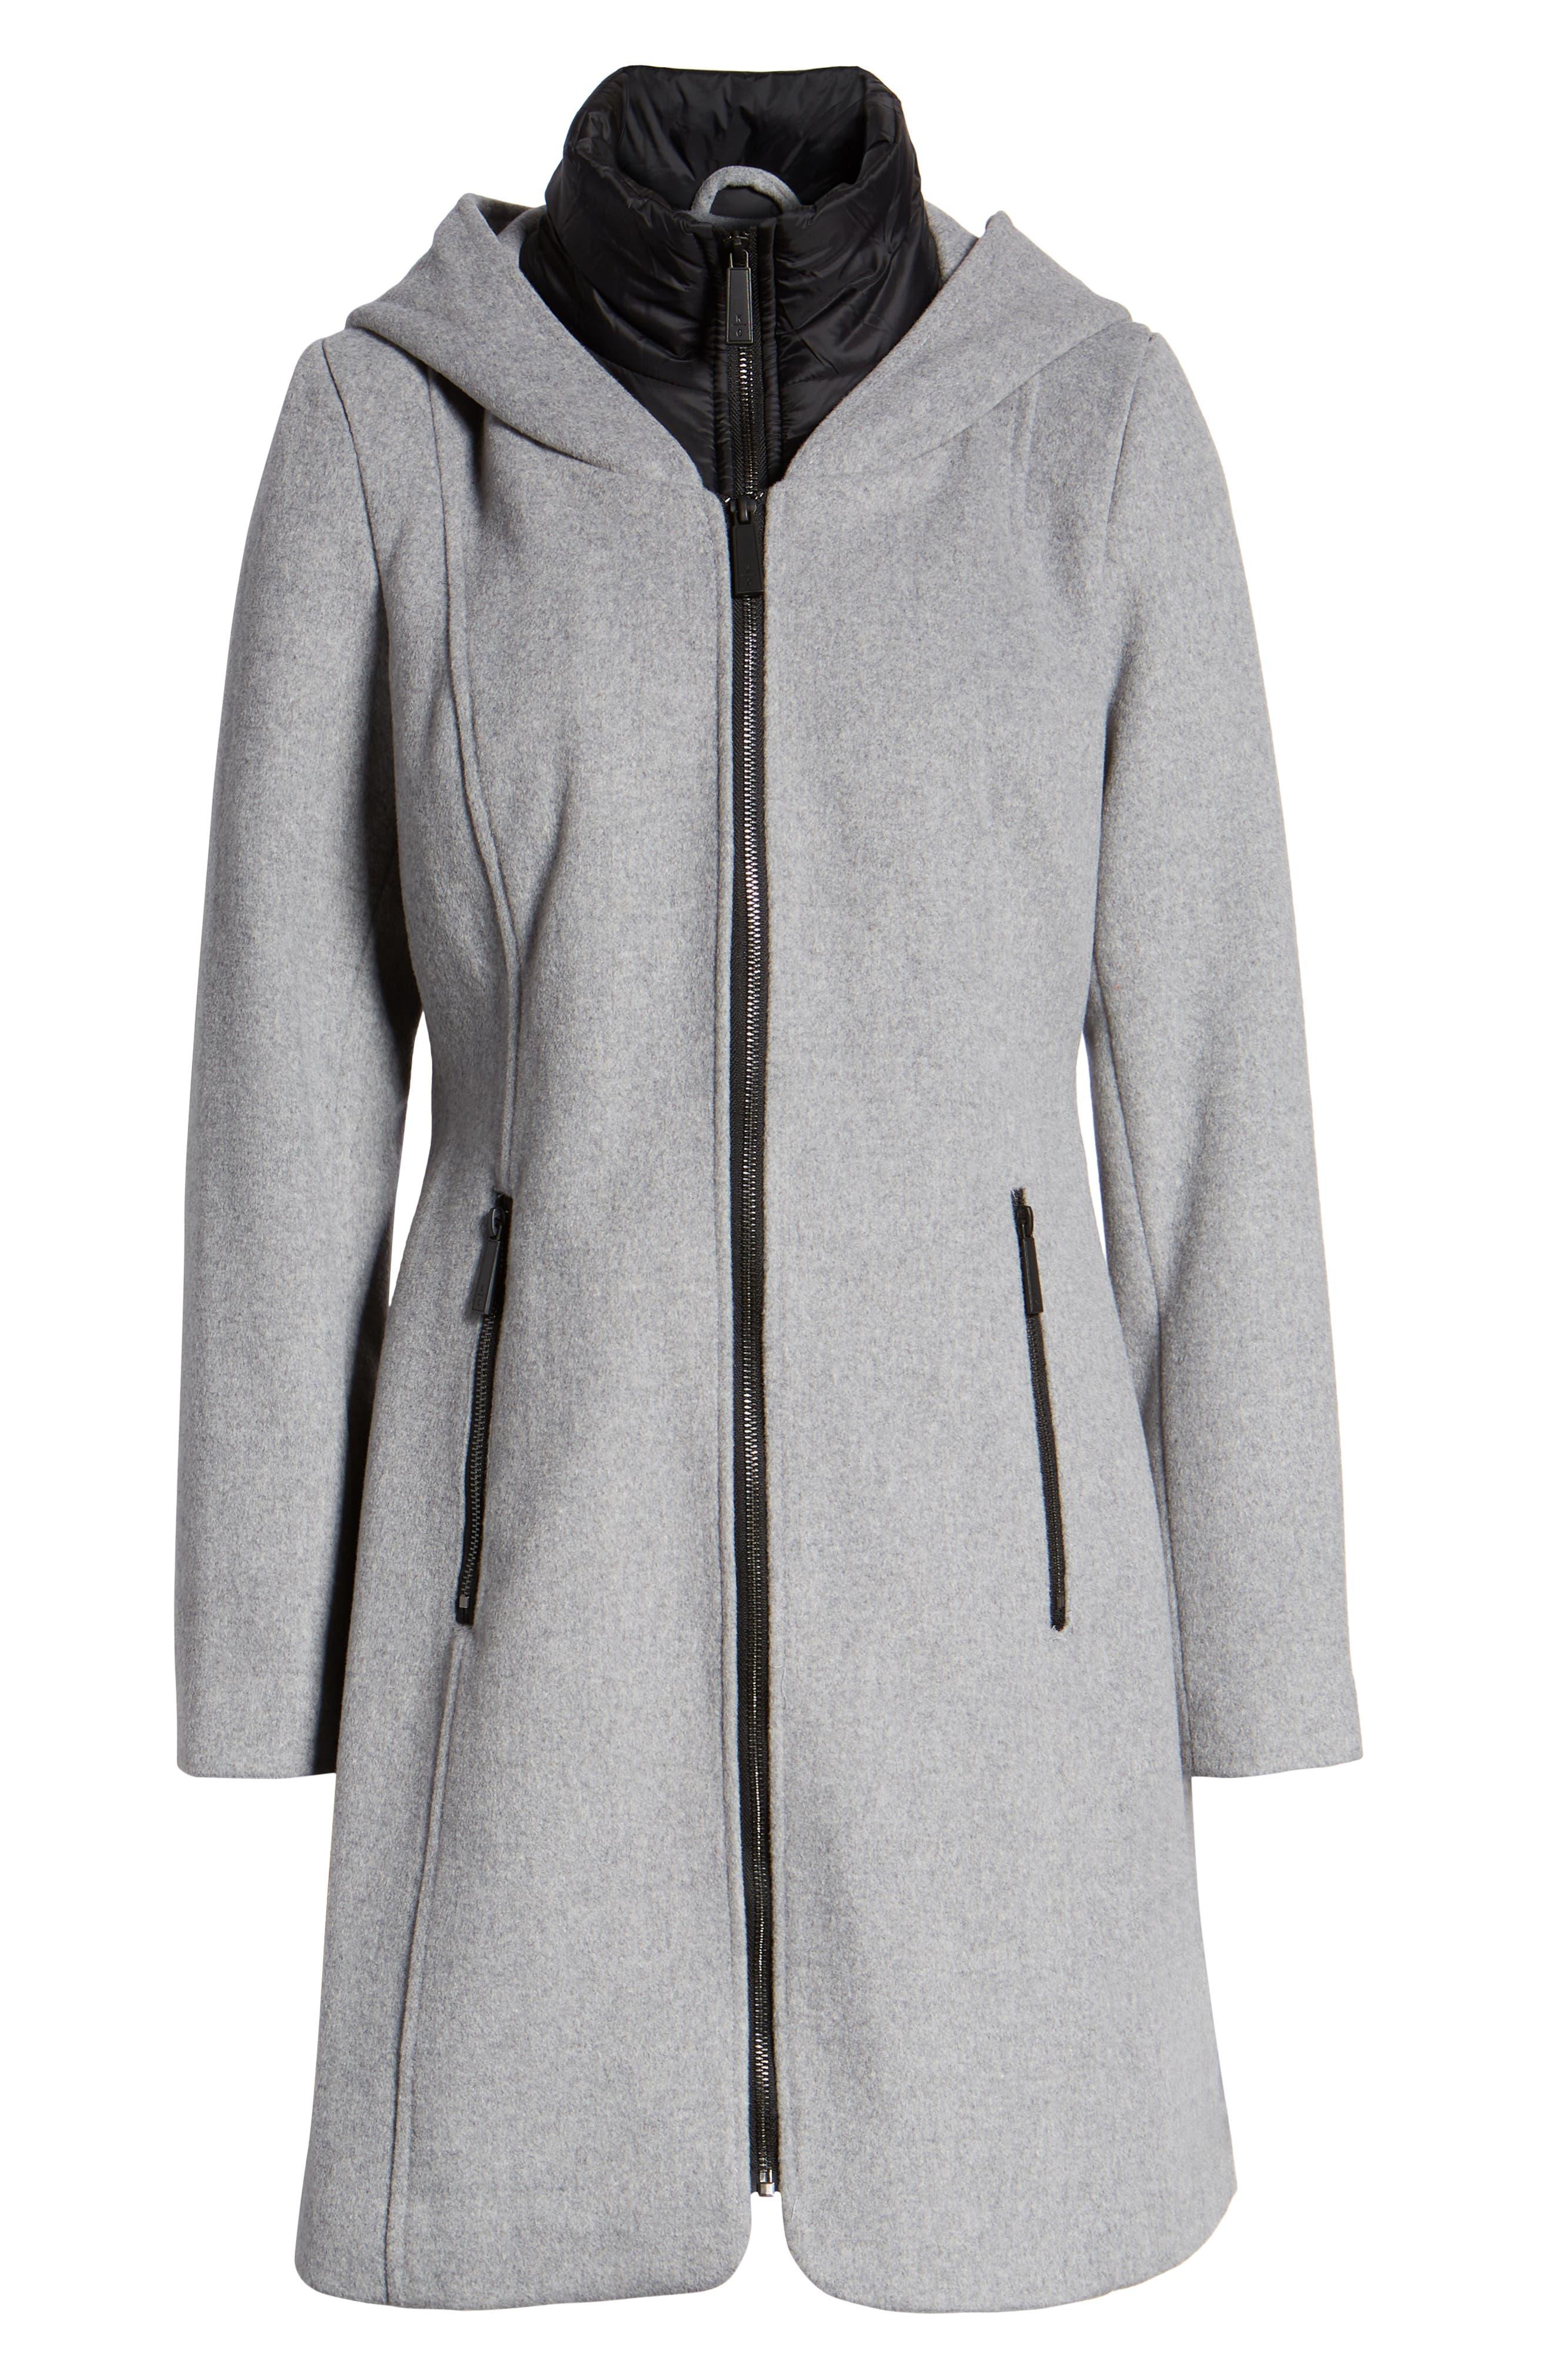 Hooded Twill Coat,                             Alternate thumbnail 6, color,                             033